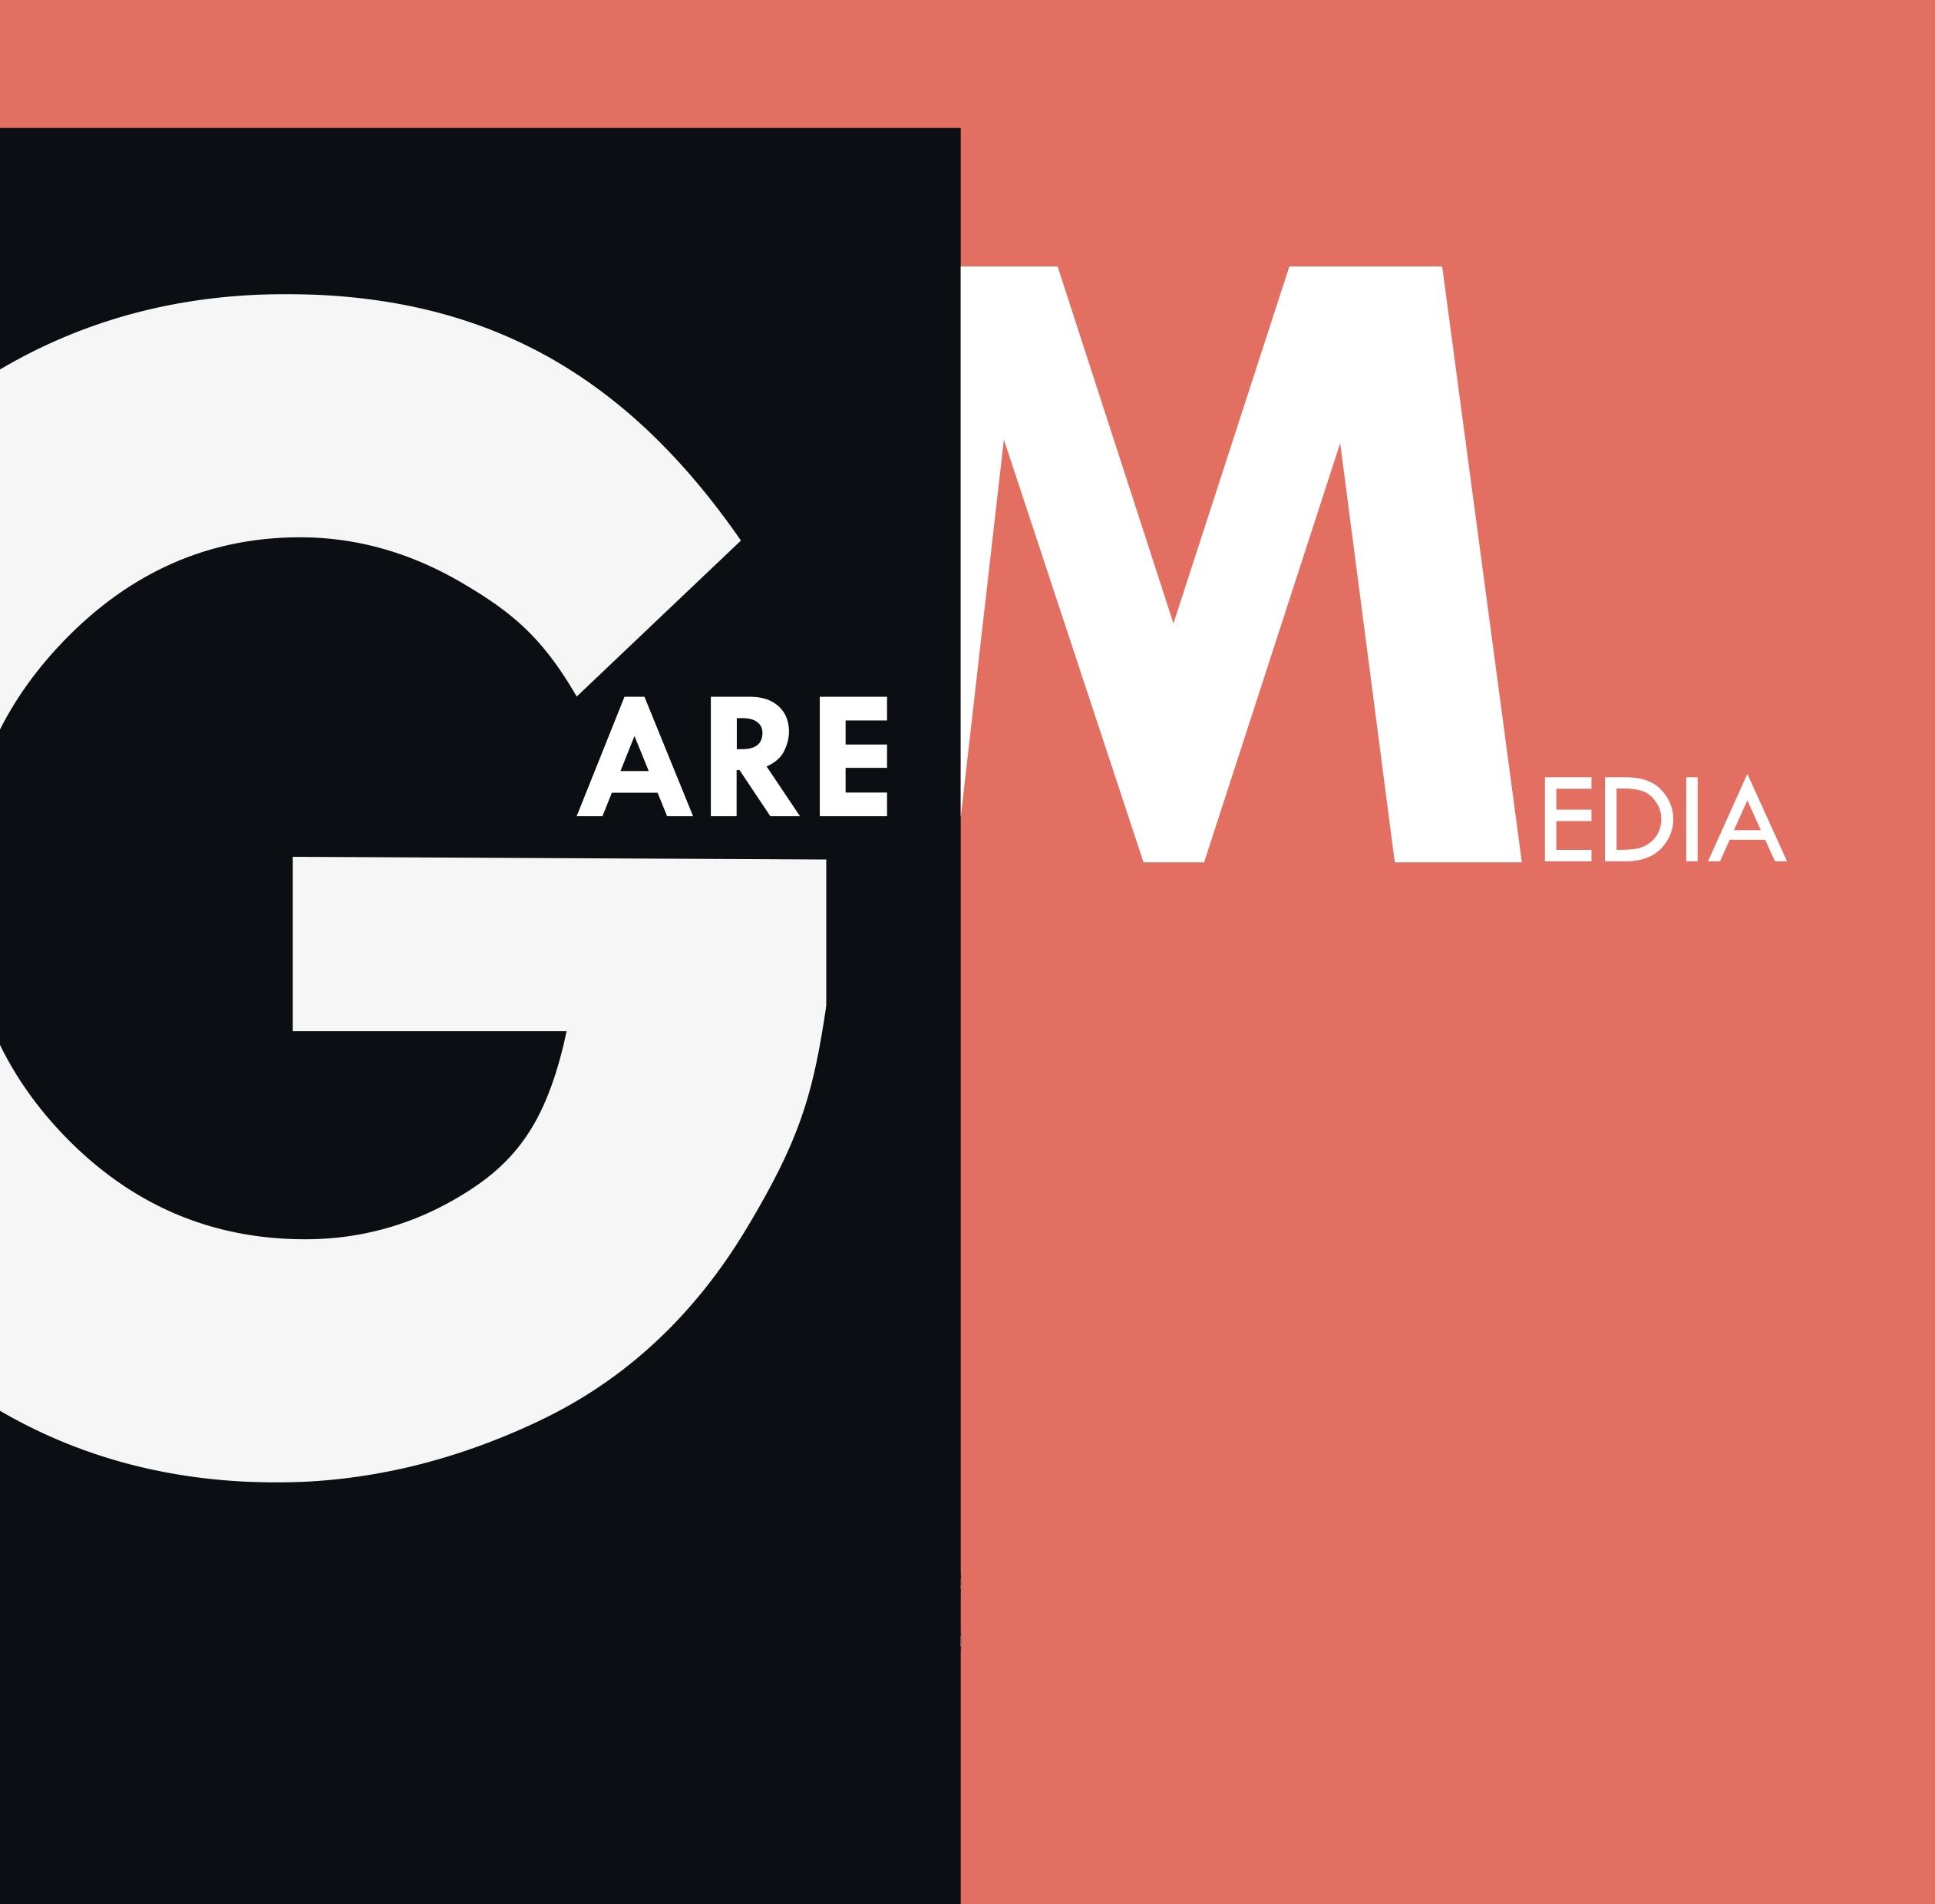 https://www.promotionmagazine.it/wp/wp-content/uploads/2019/12/Documento-Gare-Media-1-1.jpg